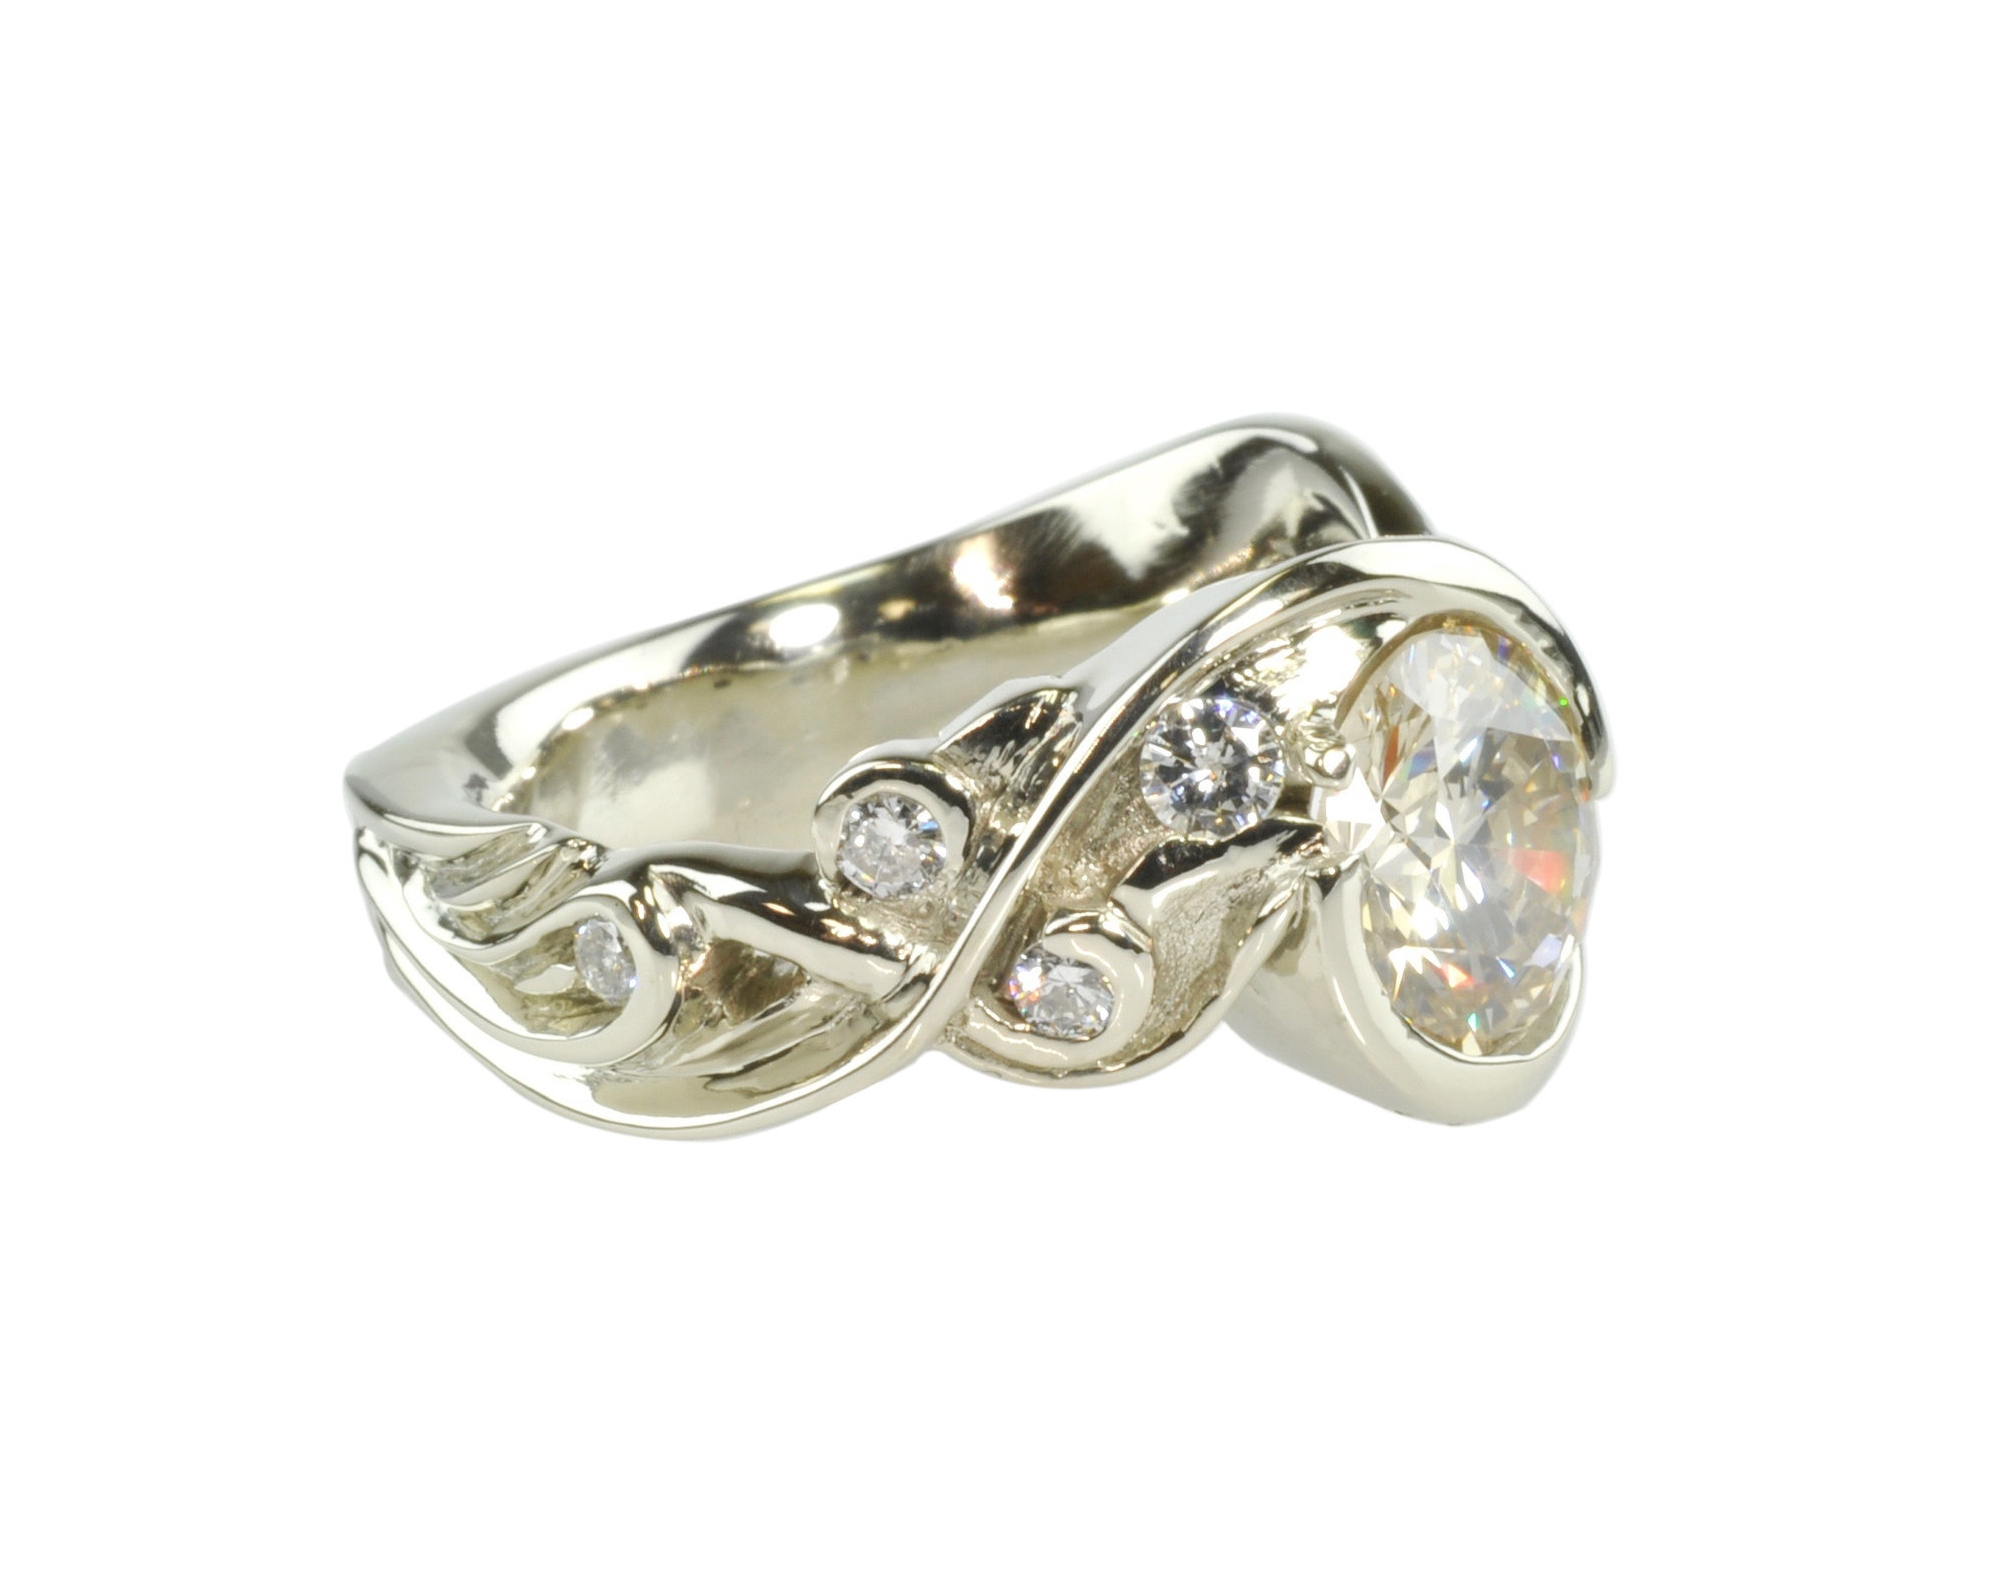 Waylon Rhoads Original 14k White Gold Ring with 2.5ct. Diamonds Center